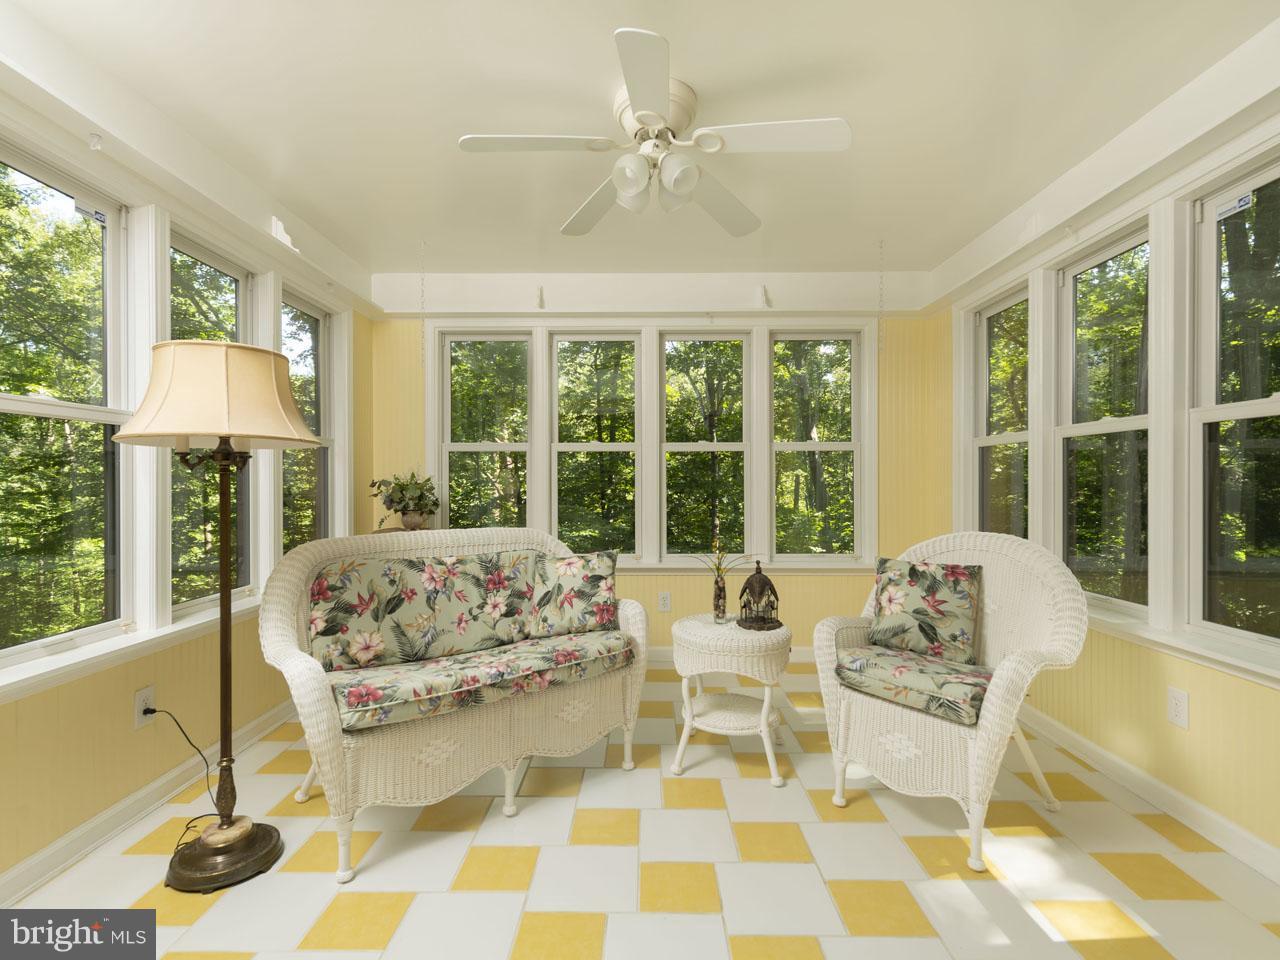 1002303700-300502419375-2021-07-22-03-27-24  |   | Alexandria Delaware Real Estate For Sale | MLS# 1002303700  - Best of Northern Virginia